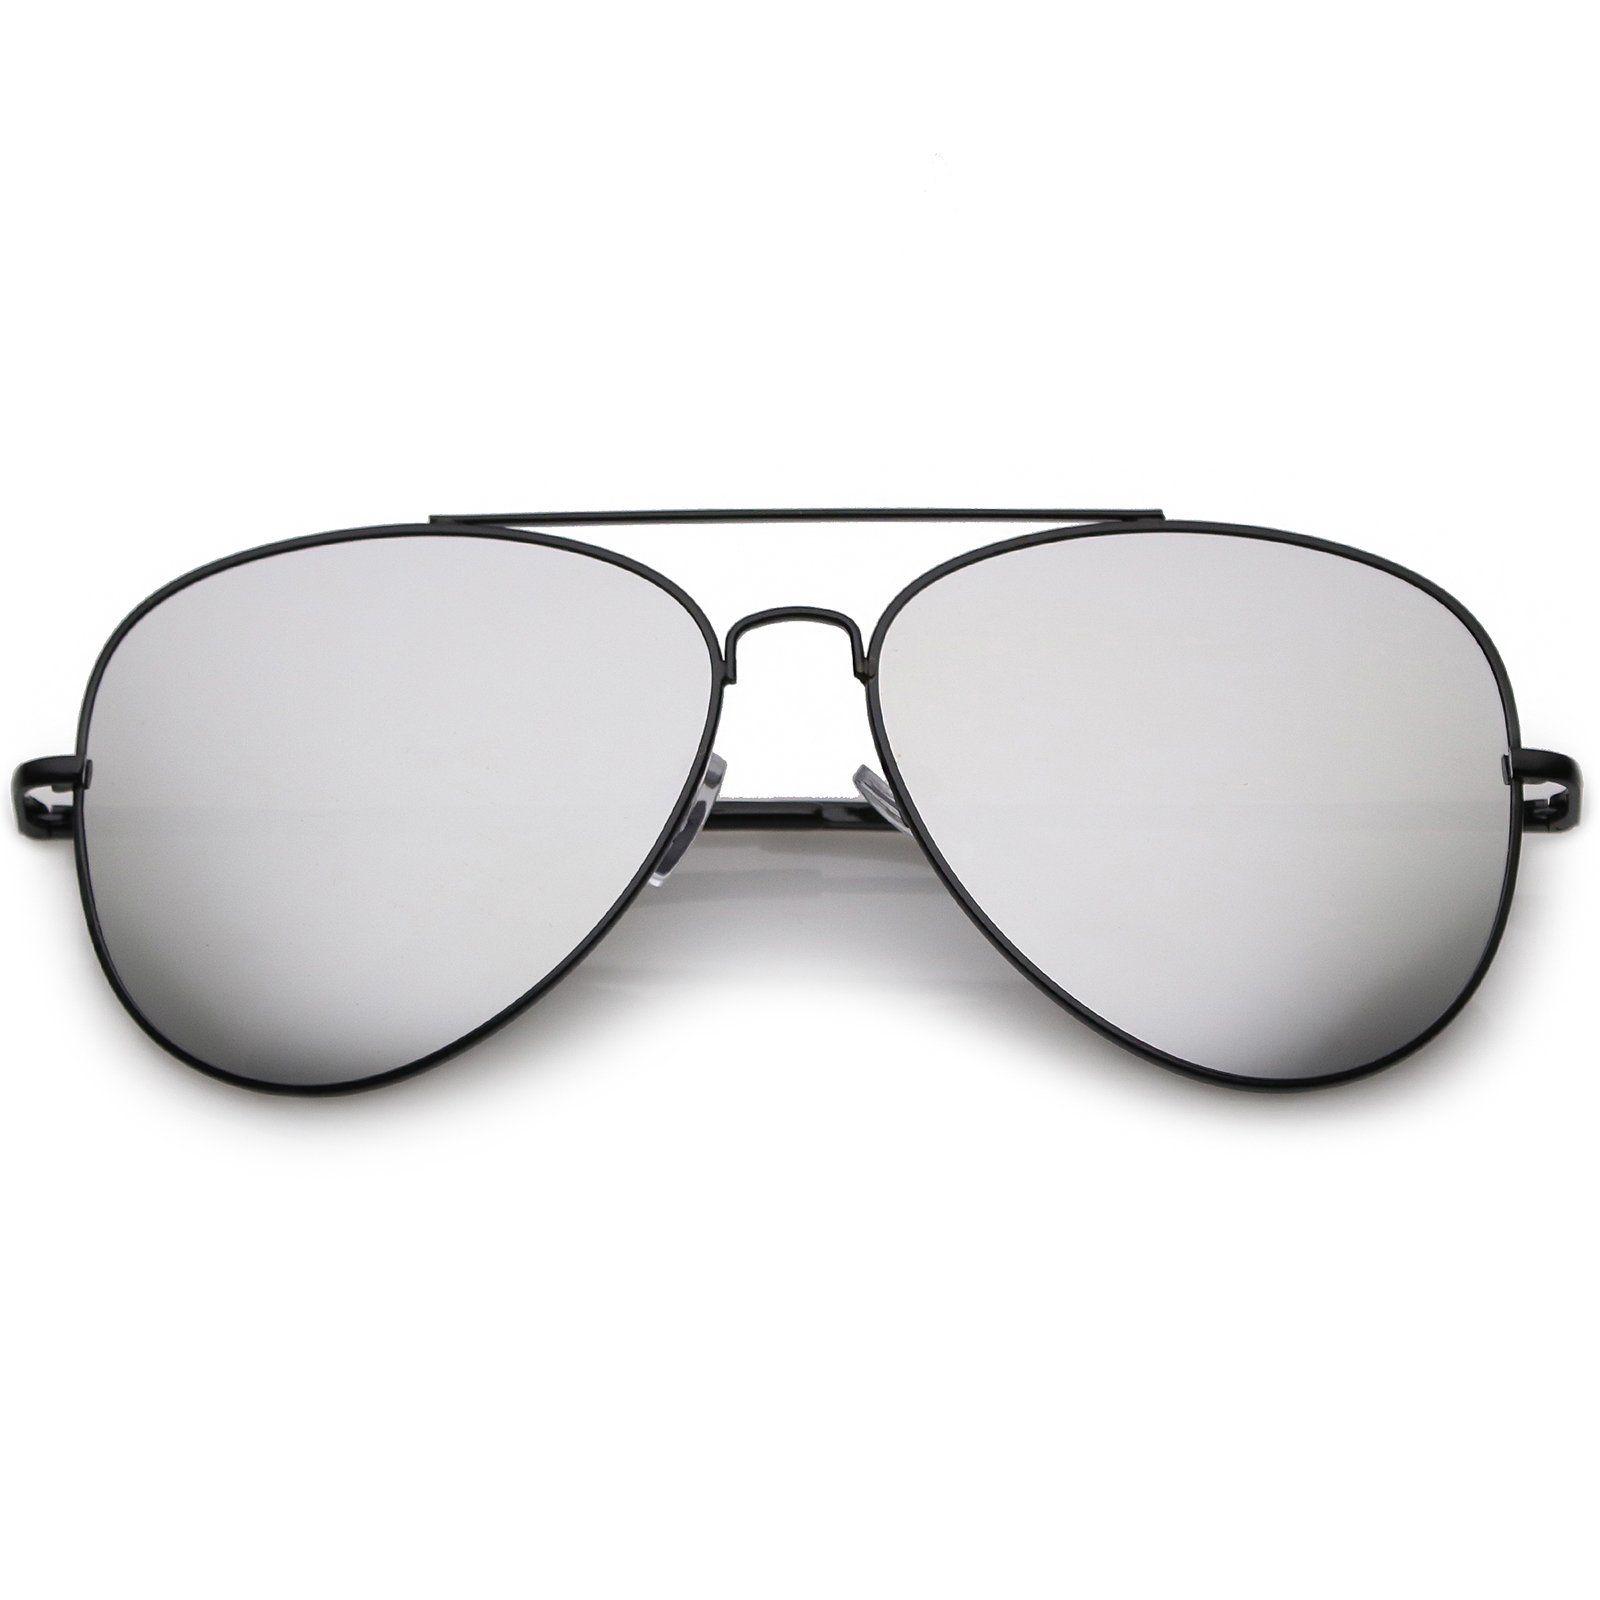 d3a454603 Classic Metal Aviator Sunglasses Slim Arms Straight Crossbar Mirrored Flat  Lens 59mm